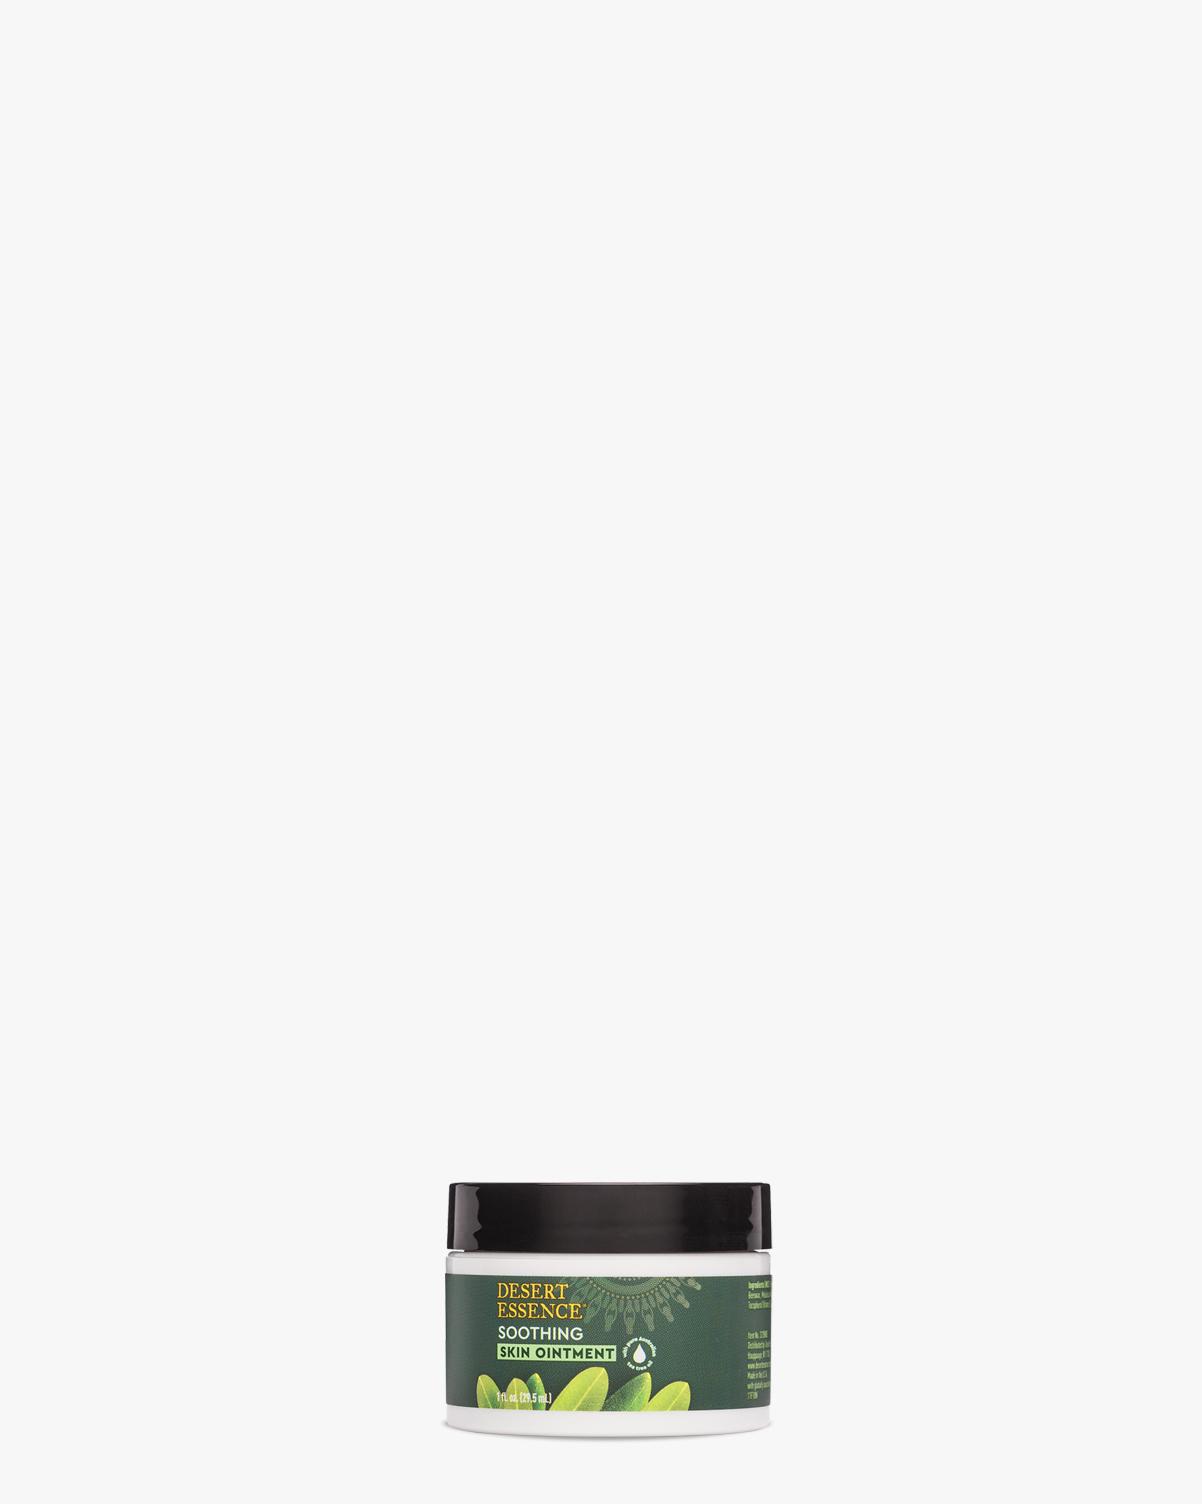 Desert Essence coupon: Desert Essence Tea Tree Oil Skin Ointment, 1 fl. oz. | Gluten-Free